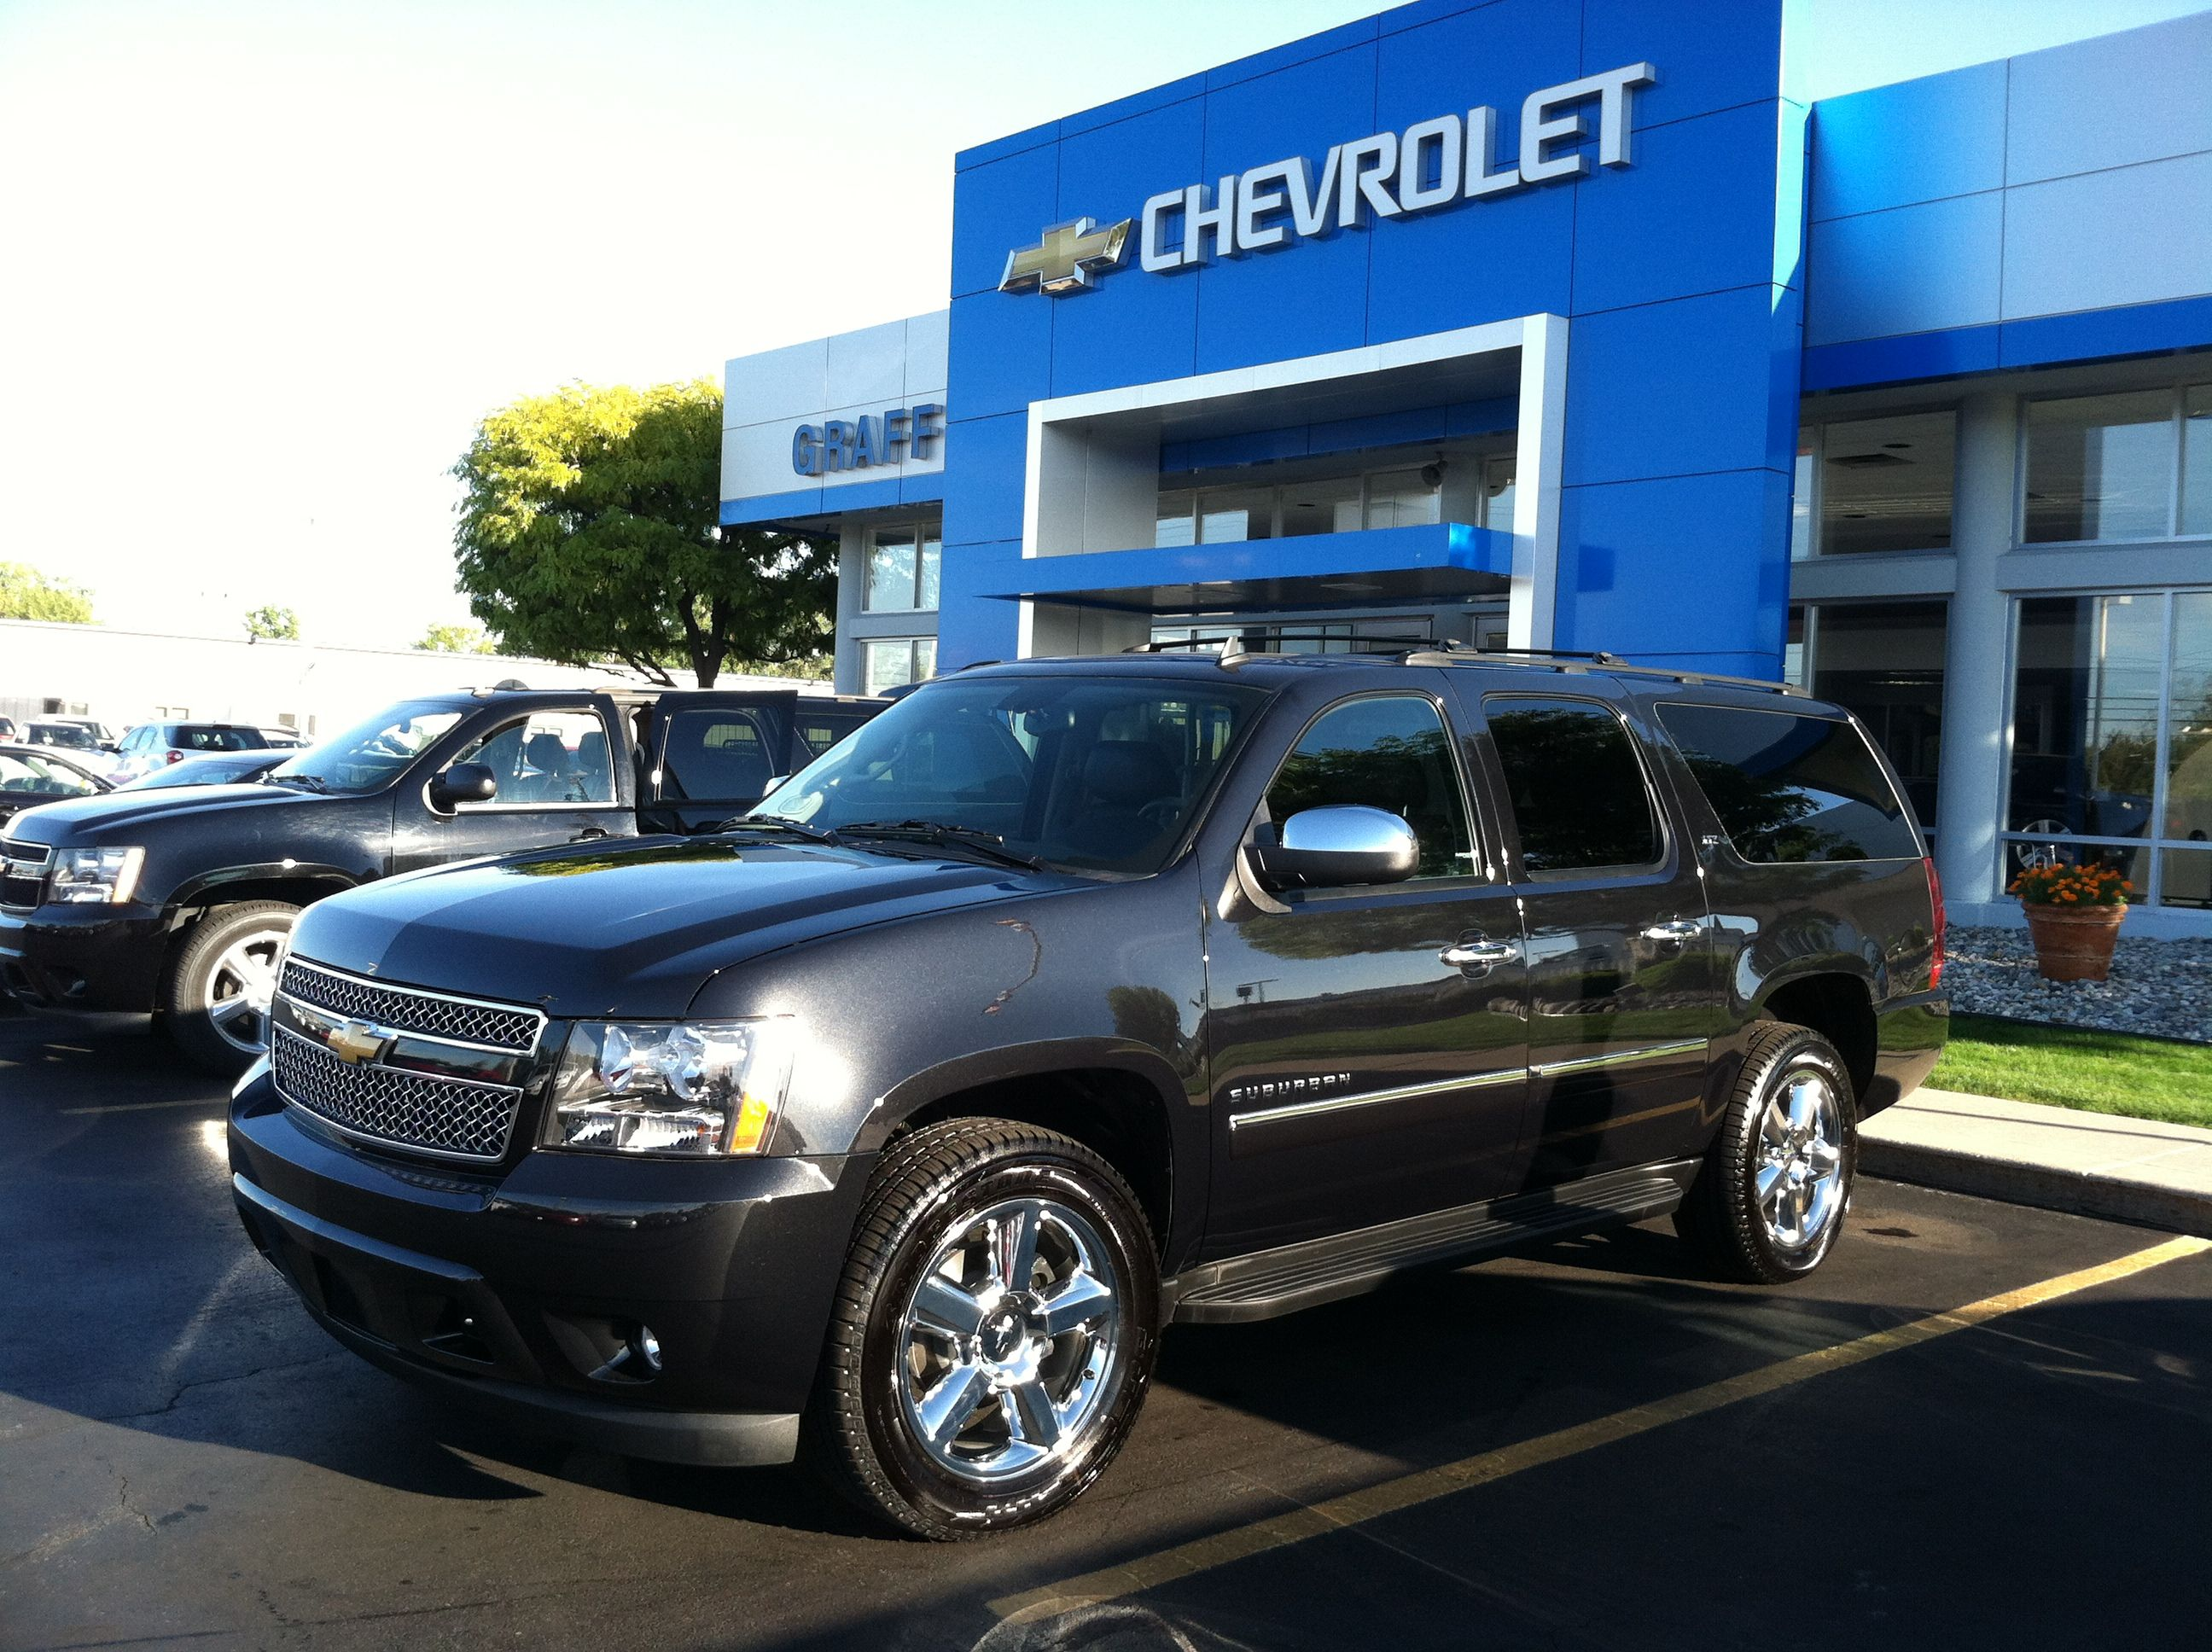 2013 Suburban Ltz Black Granite Www Graffbaycity Com Chevrolet